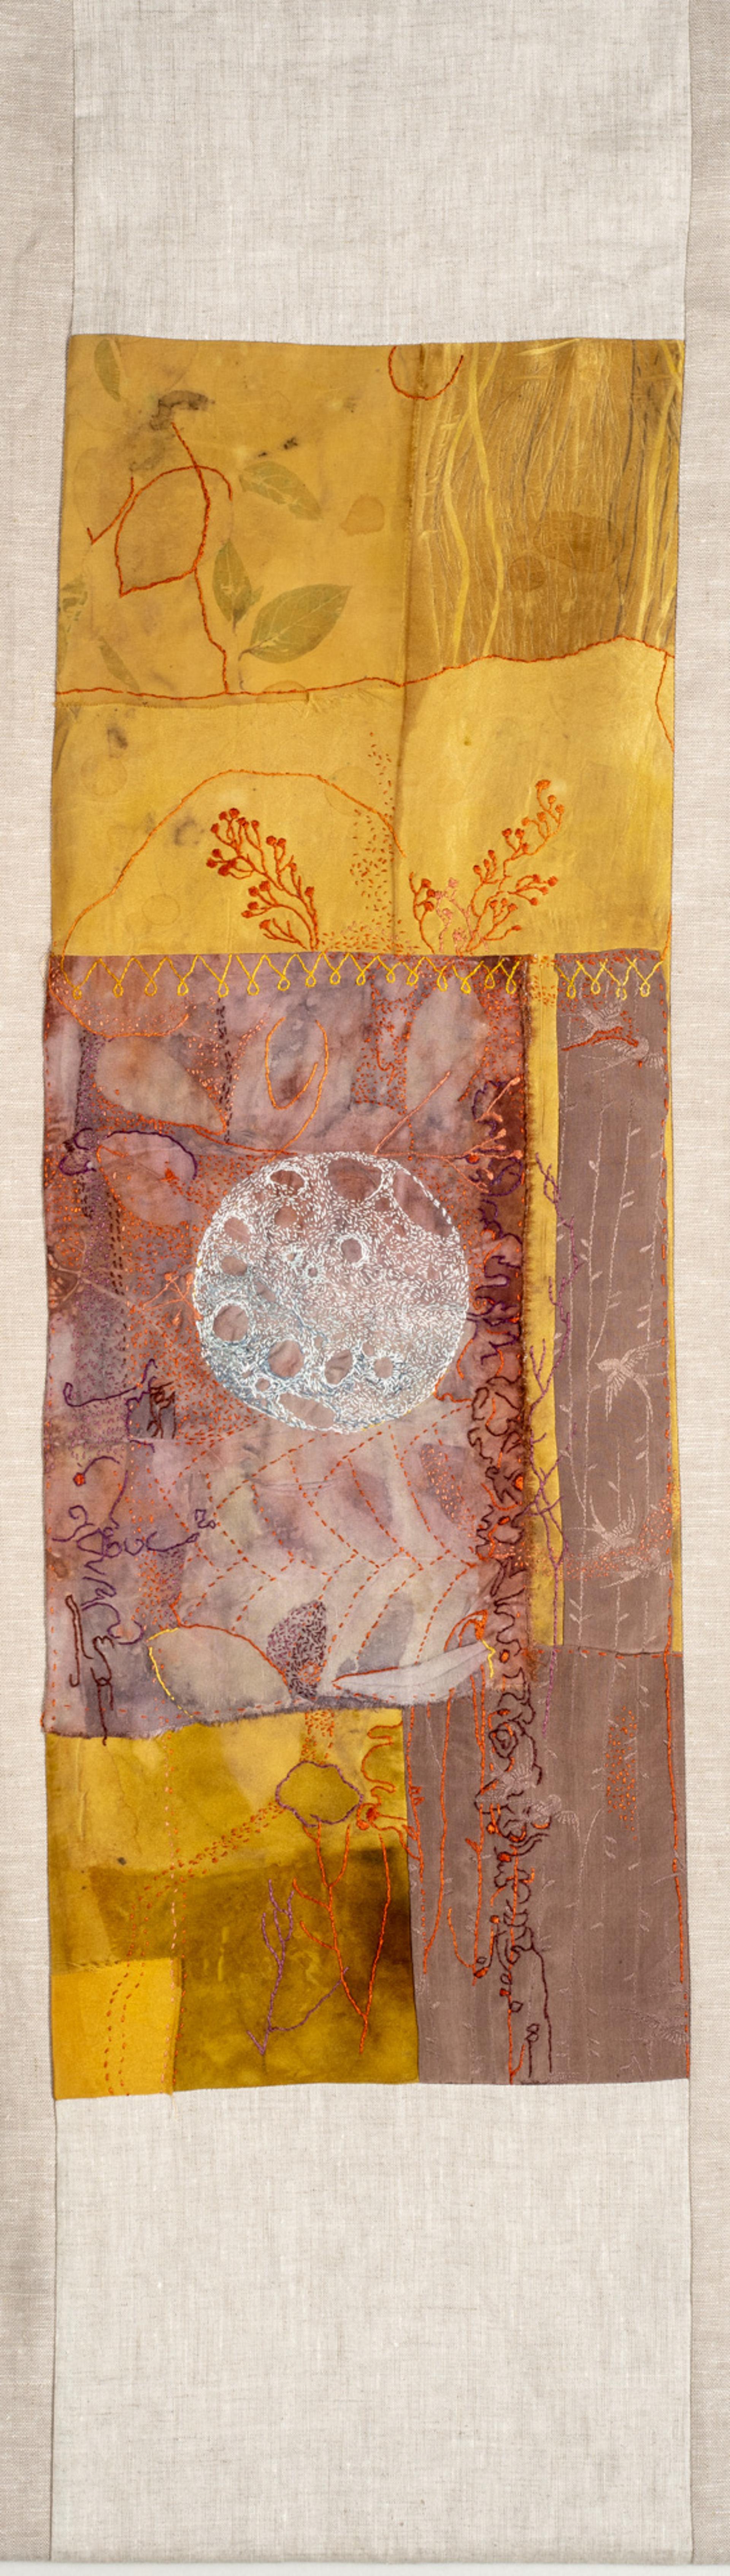 Solstice Migration by Caryn Friedlander